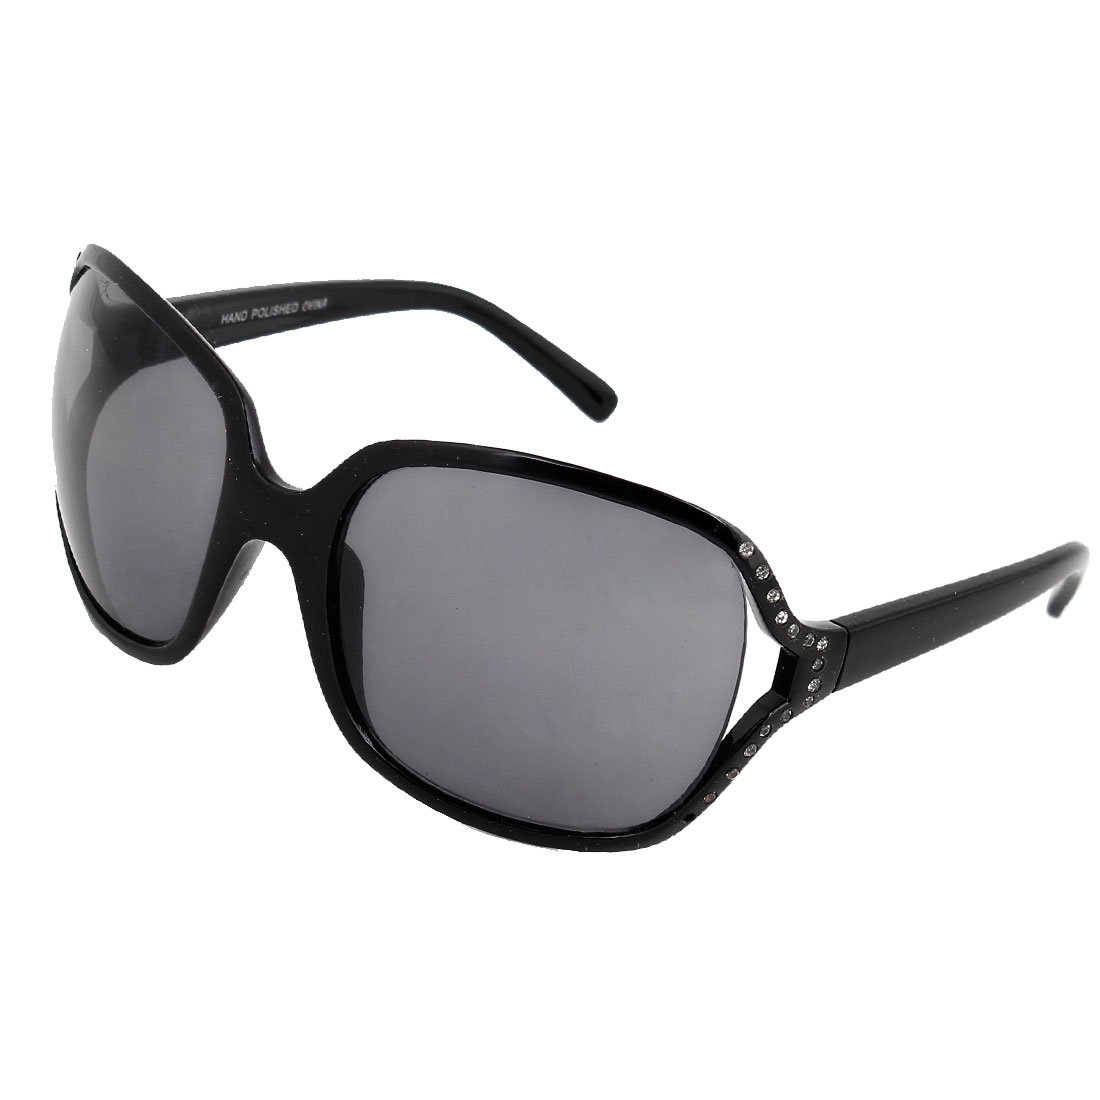 Black Rhinestones Detail Plastic Full Rim Sunglasses Eyeglasses